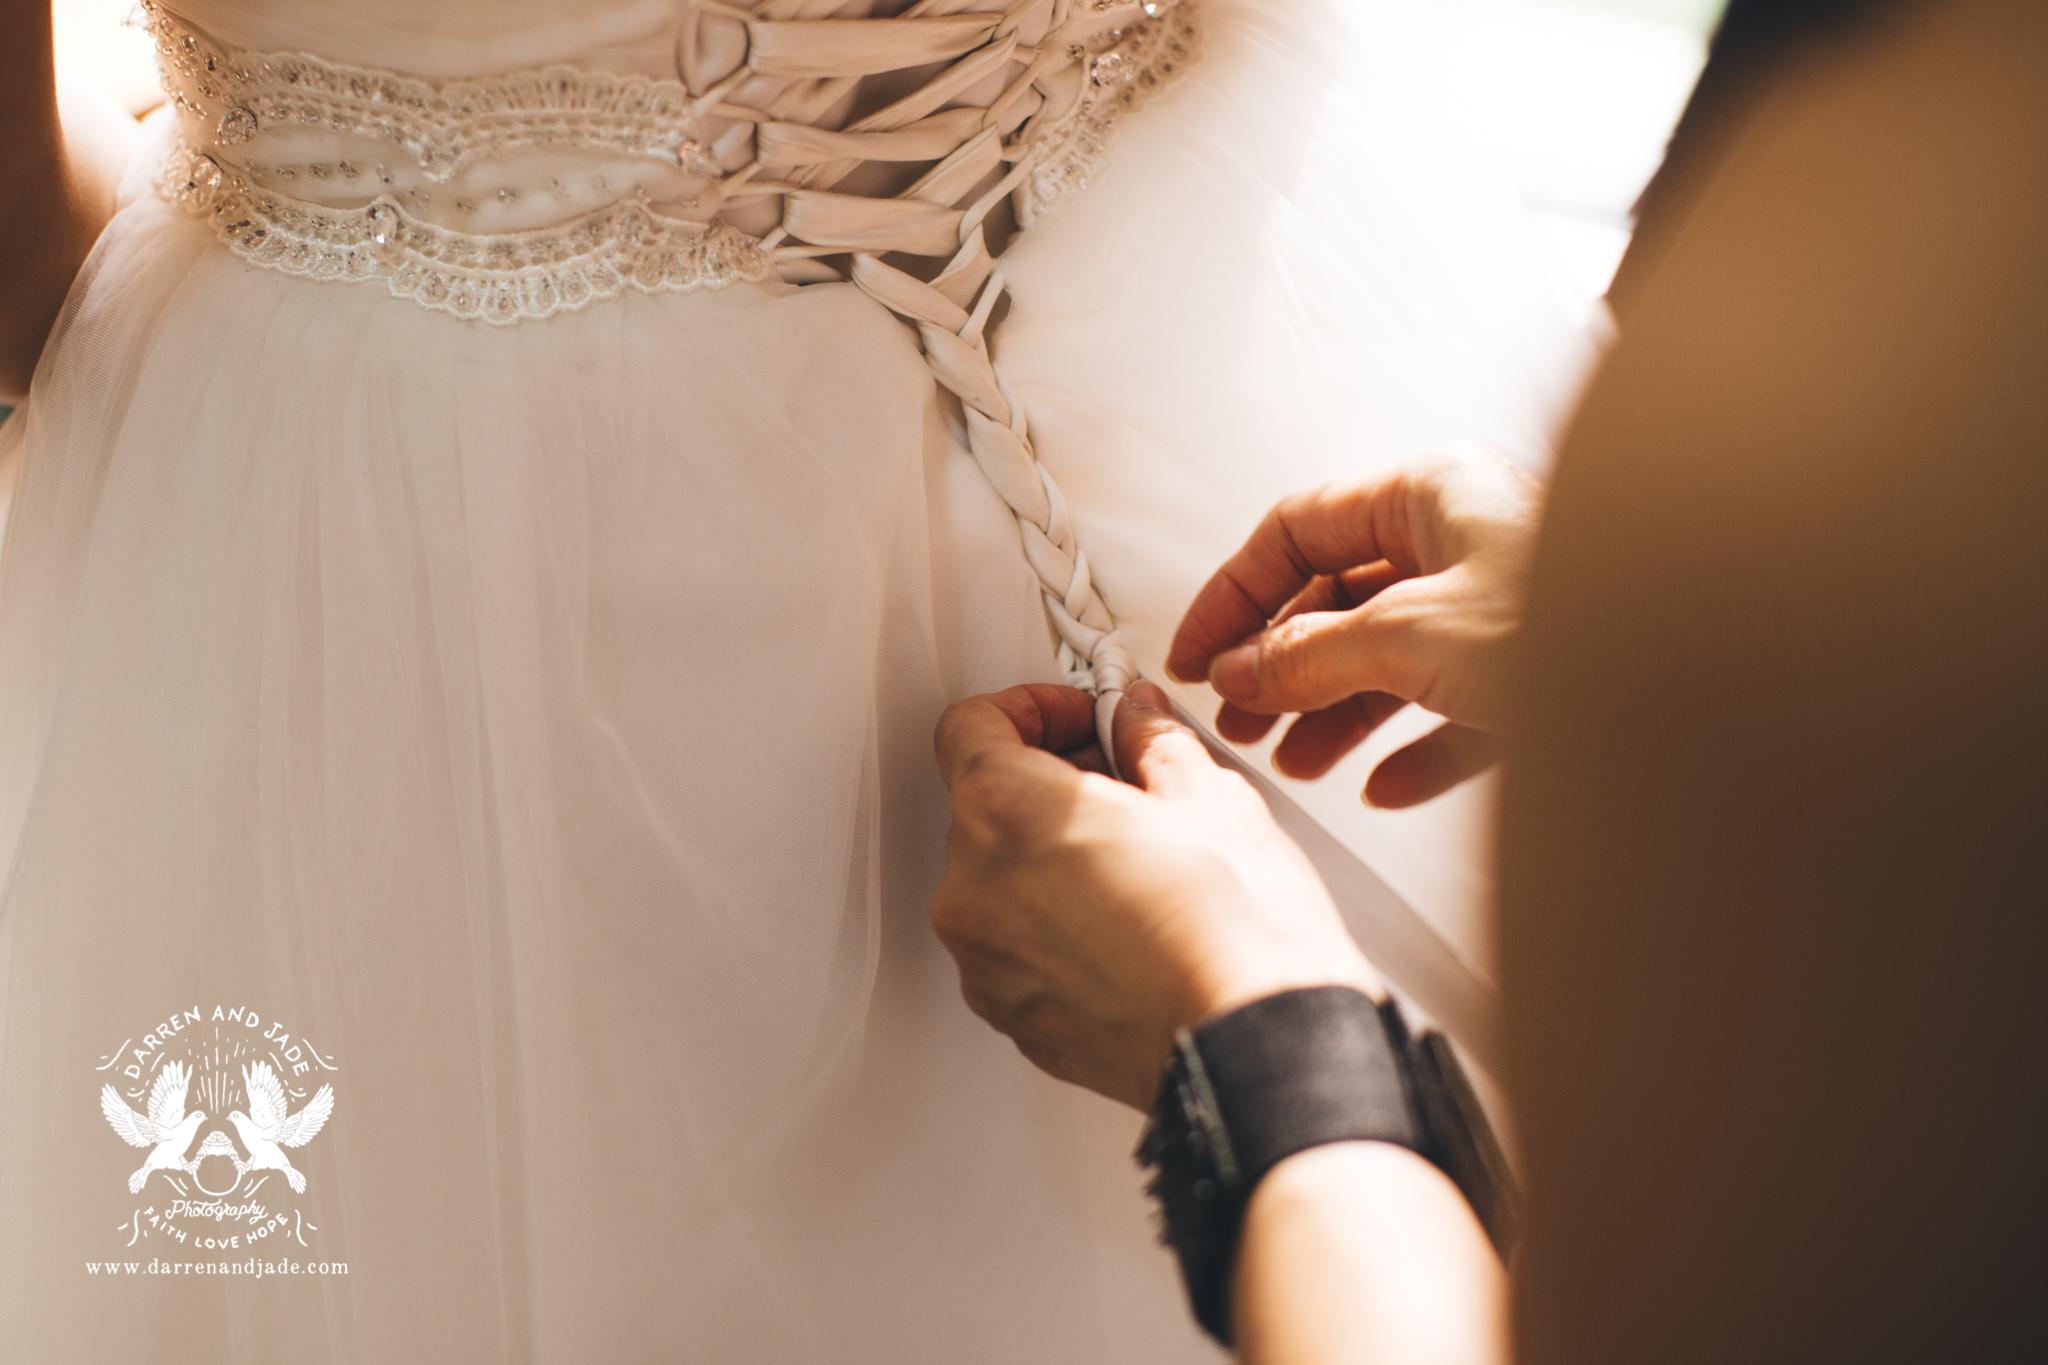 Bel & Emans - Wedding - Blog (9 of 69).jpg